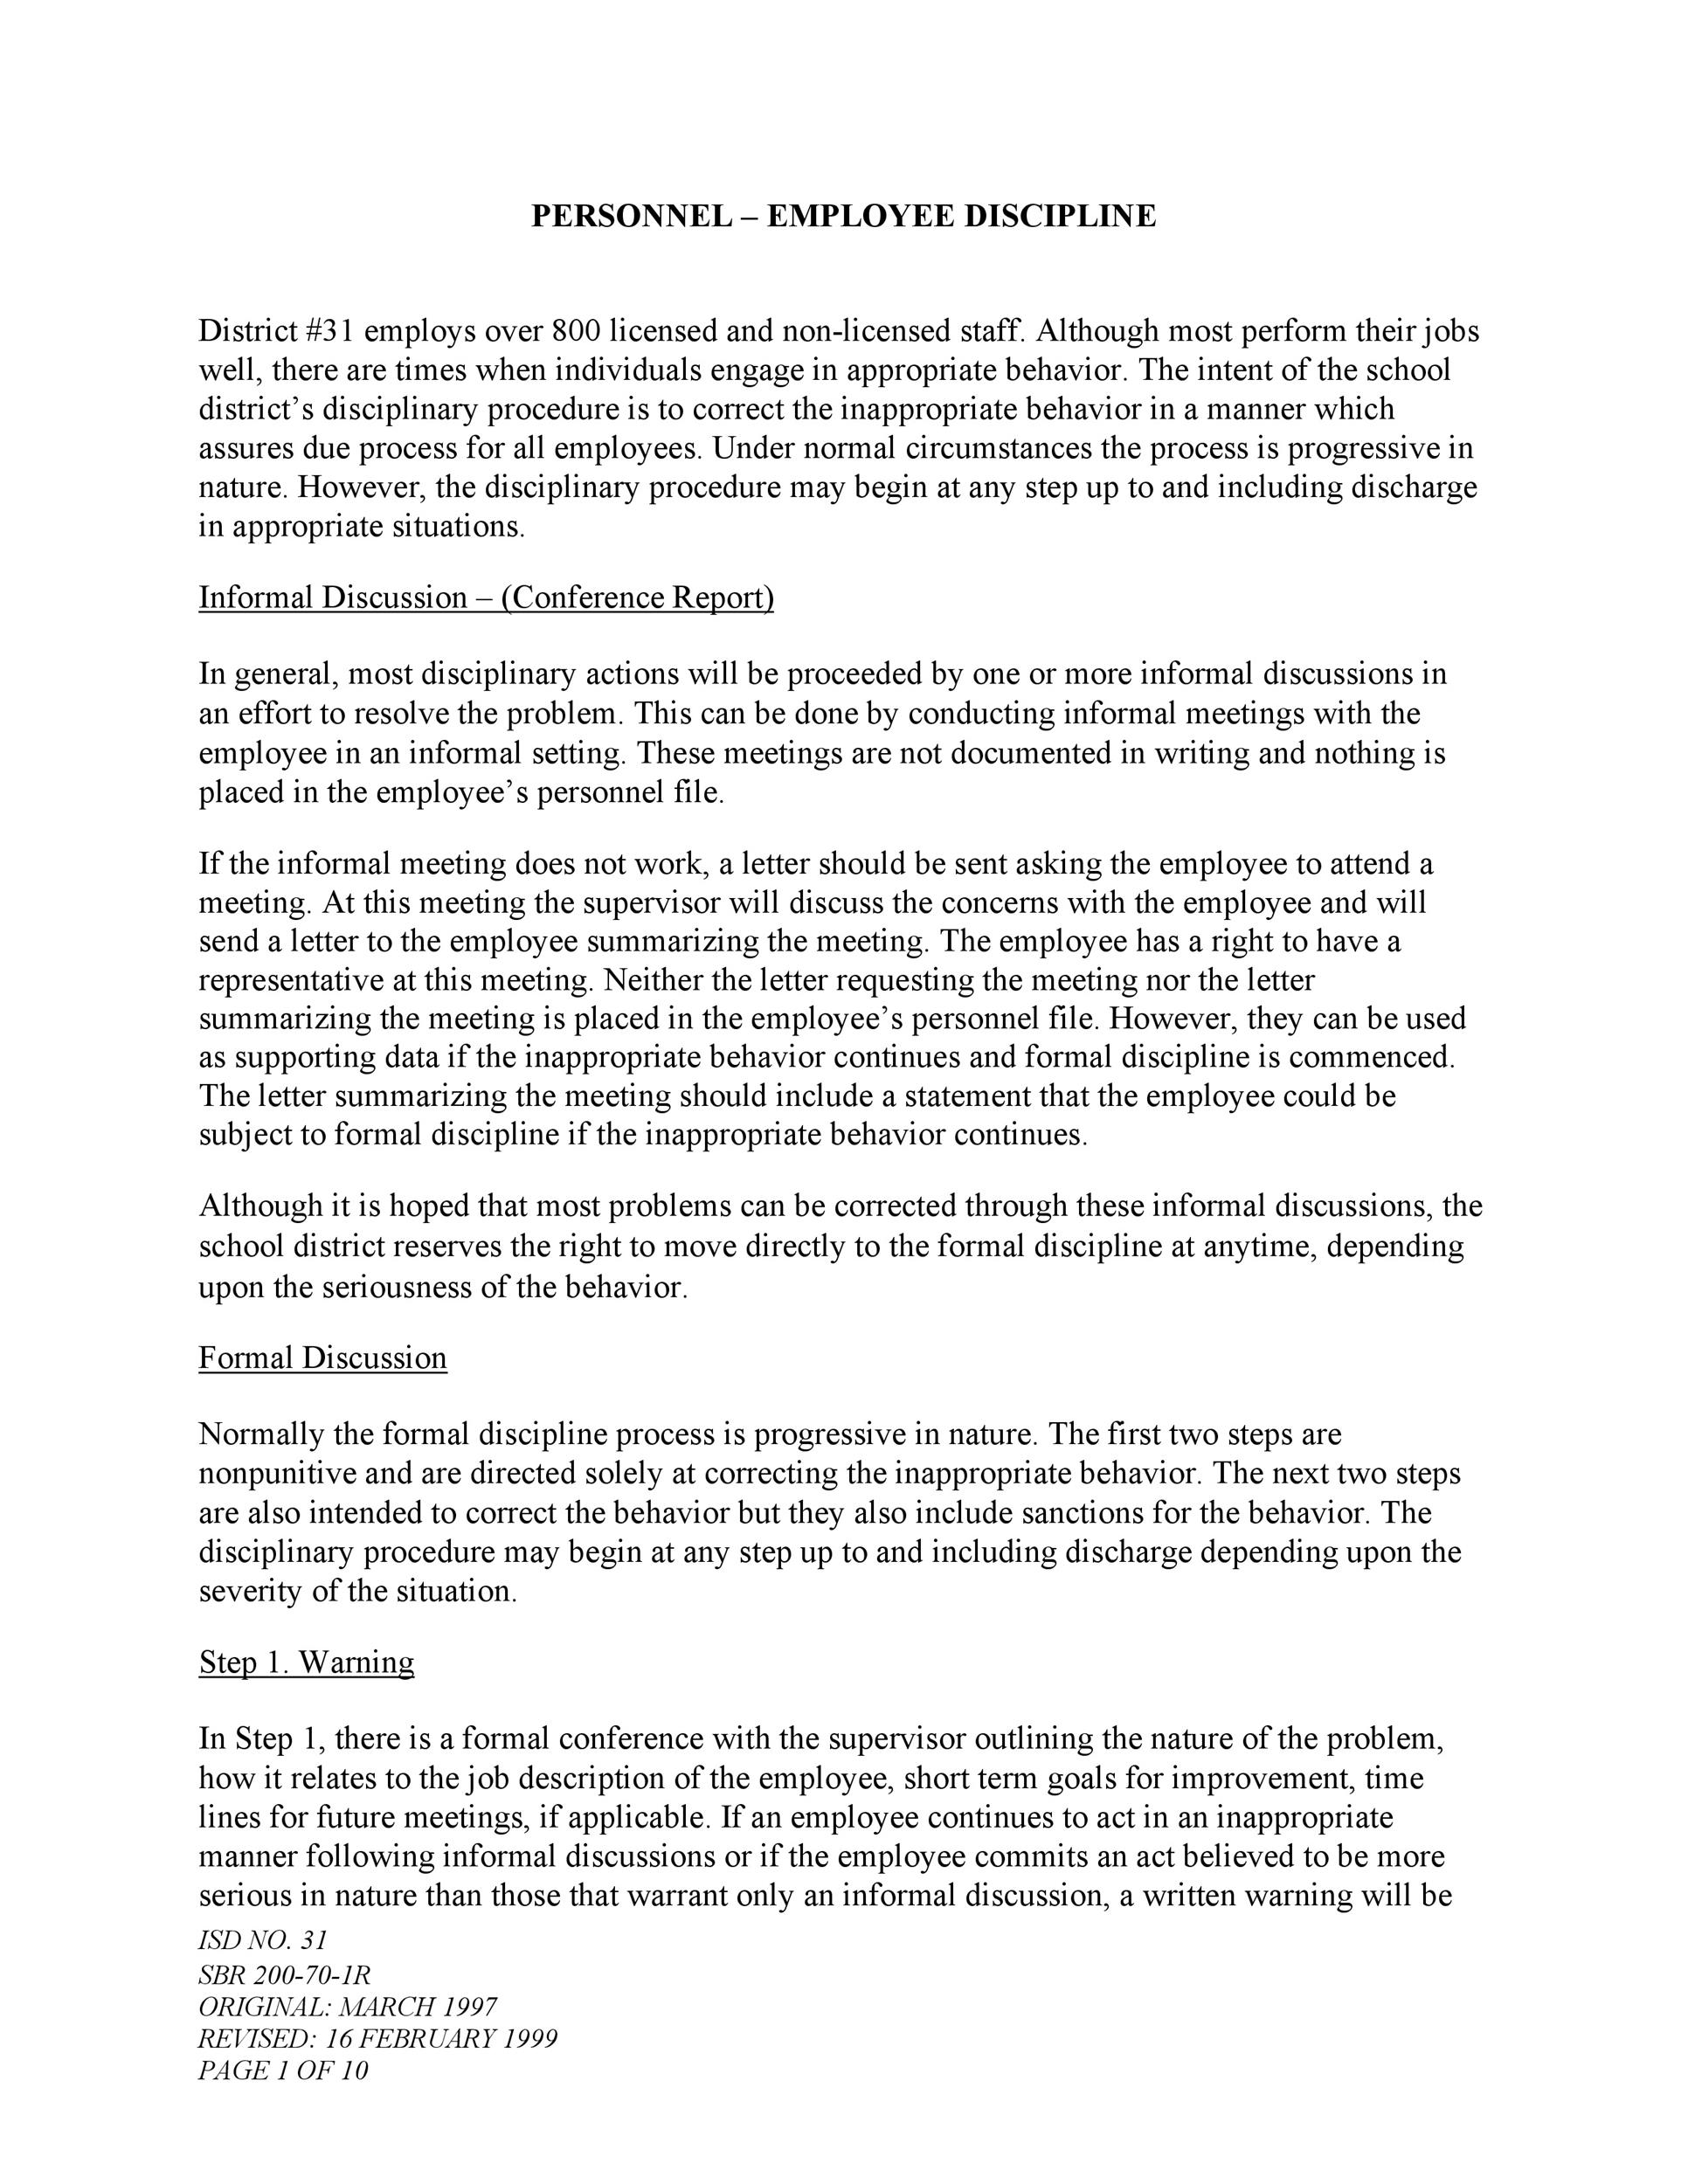 Employee Insubordination Warning Letter from templatelab.com